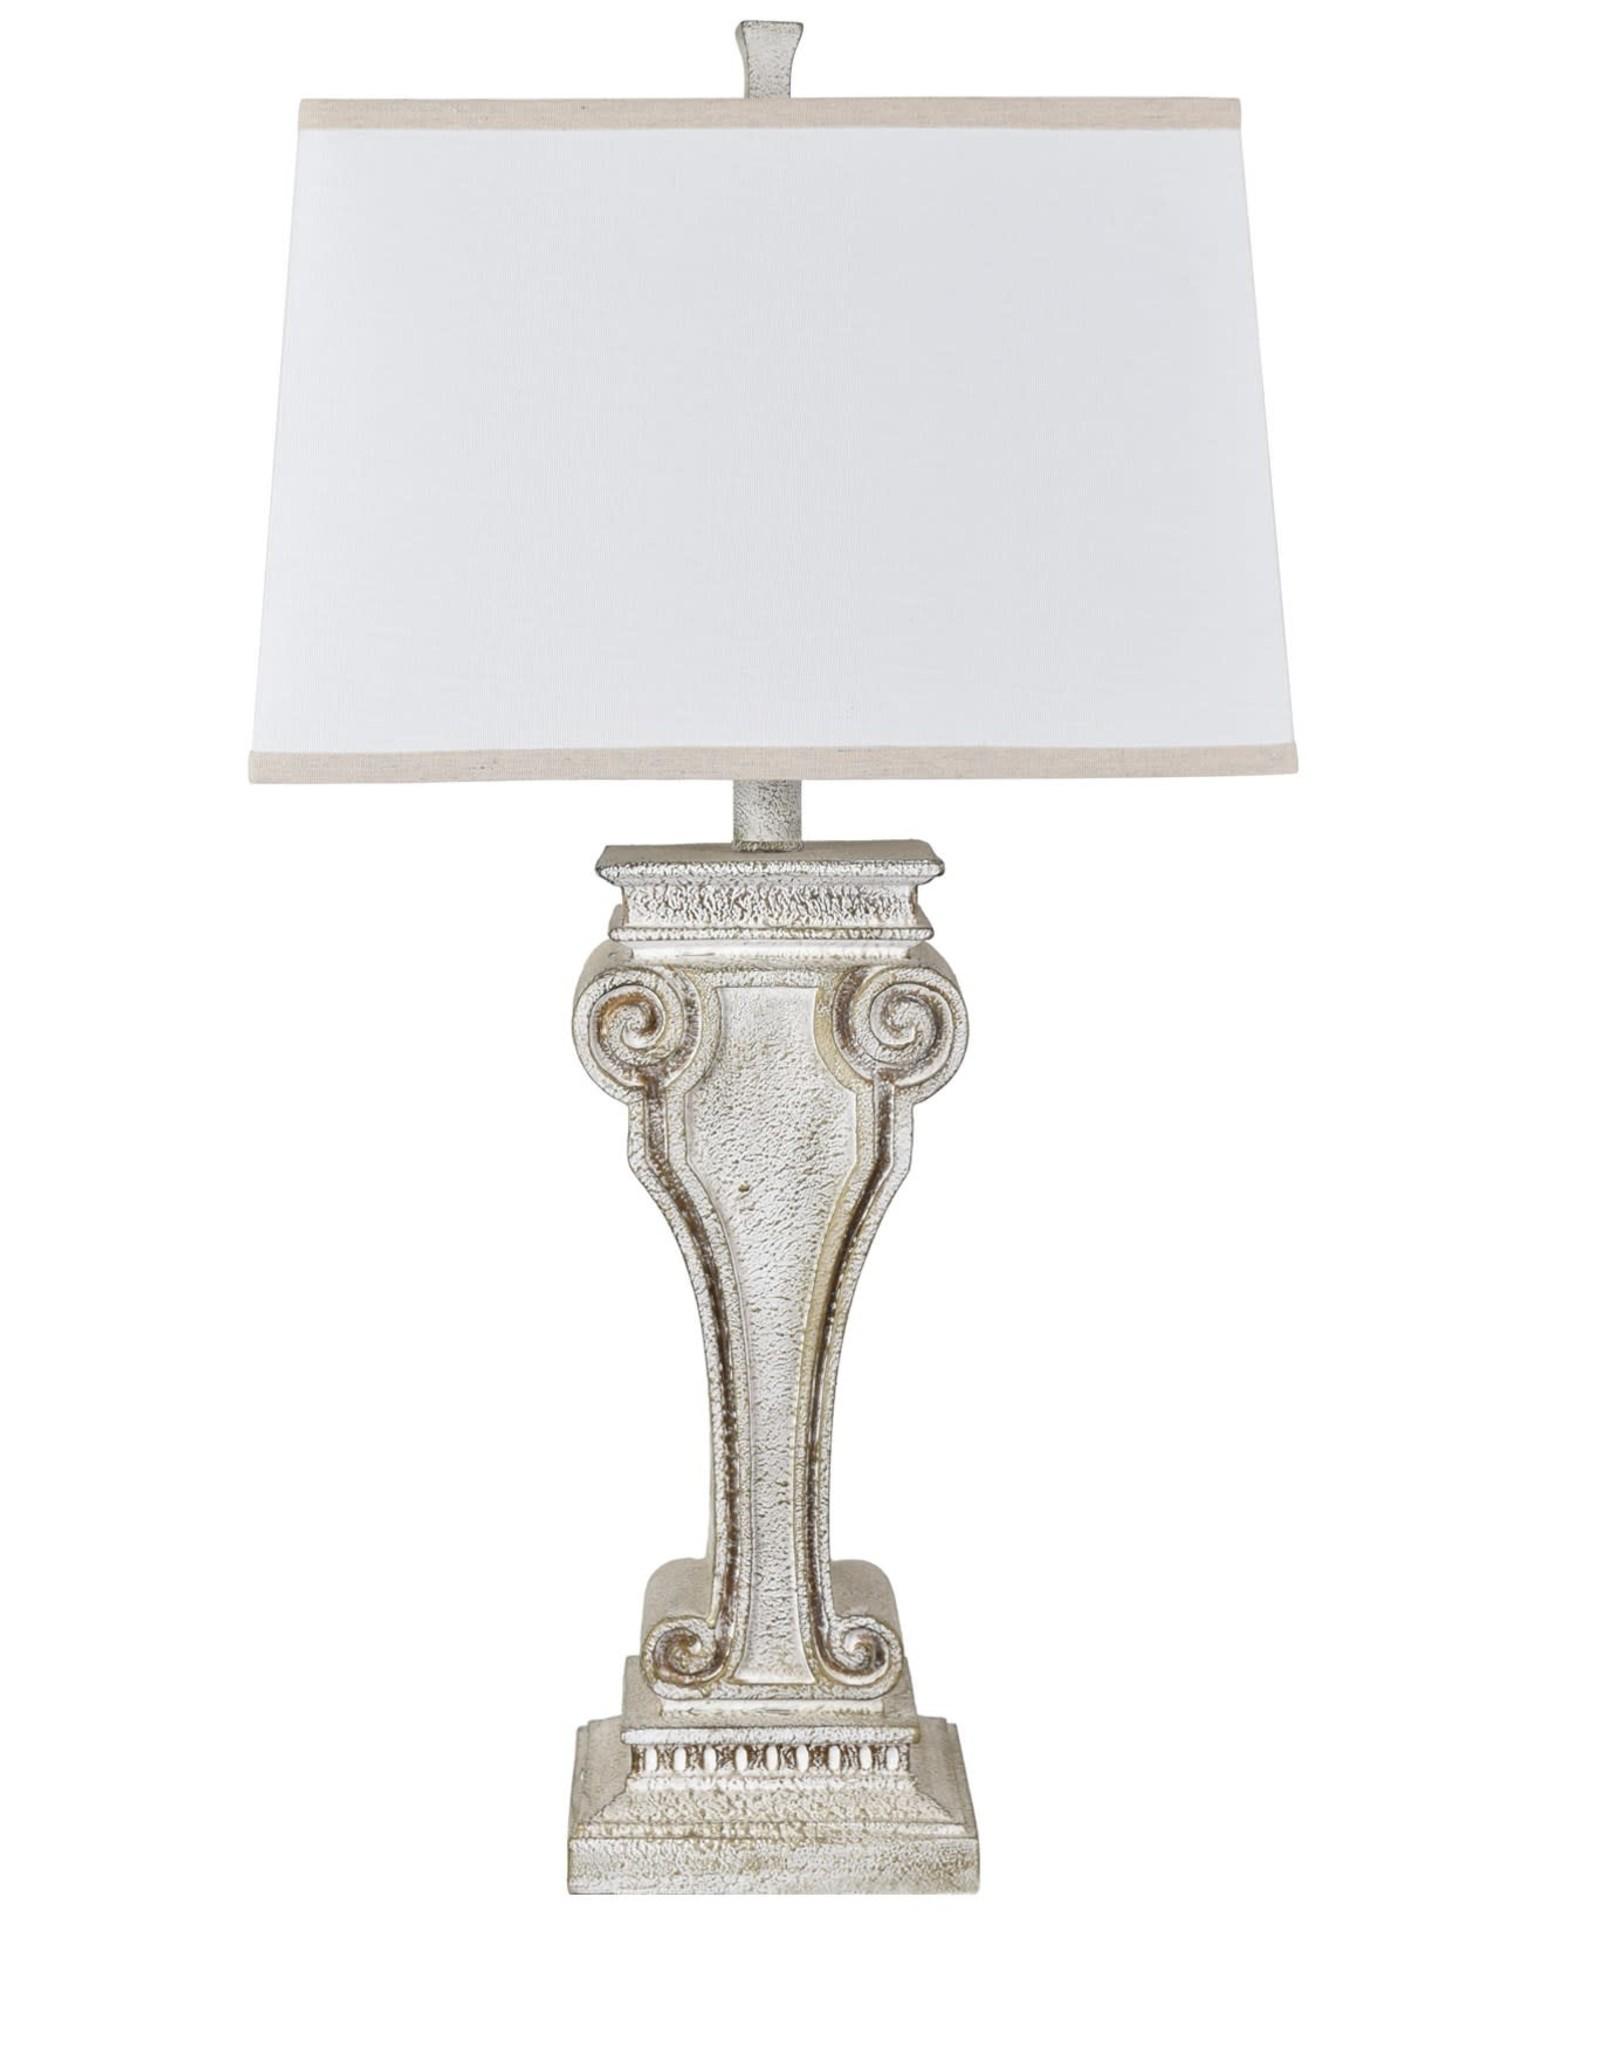 Crestview Carnegie Resin Table Lamp 33.5' tall